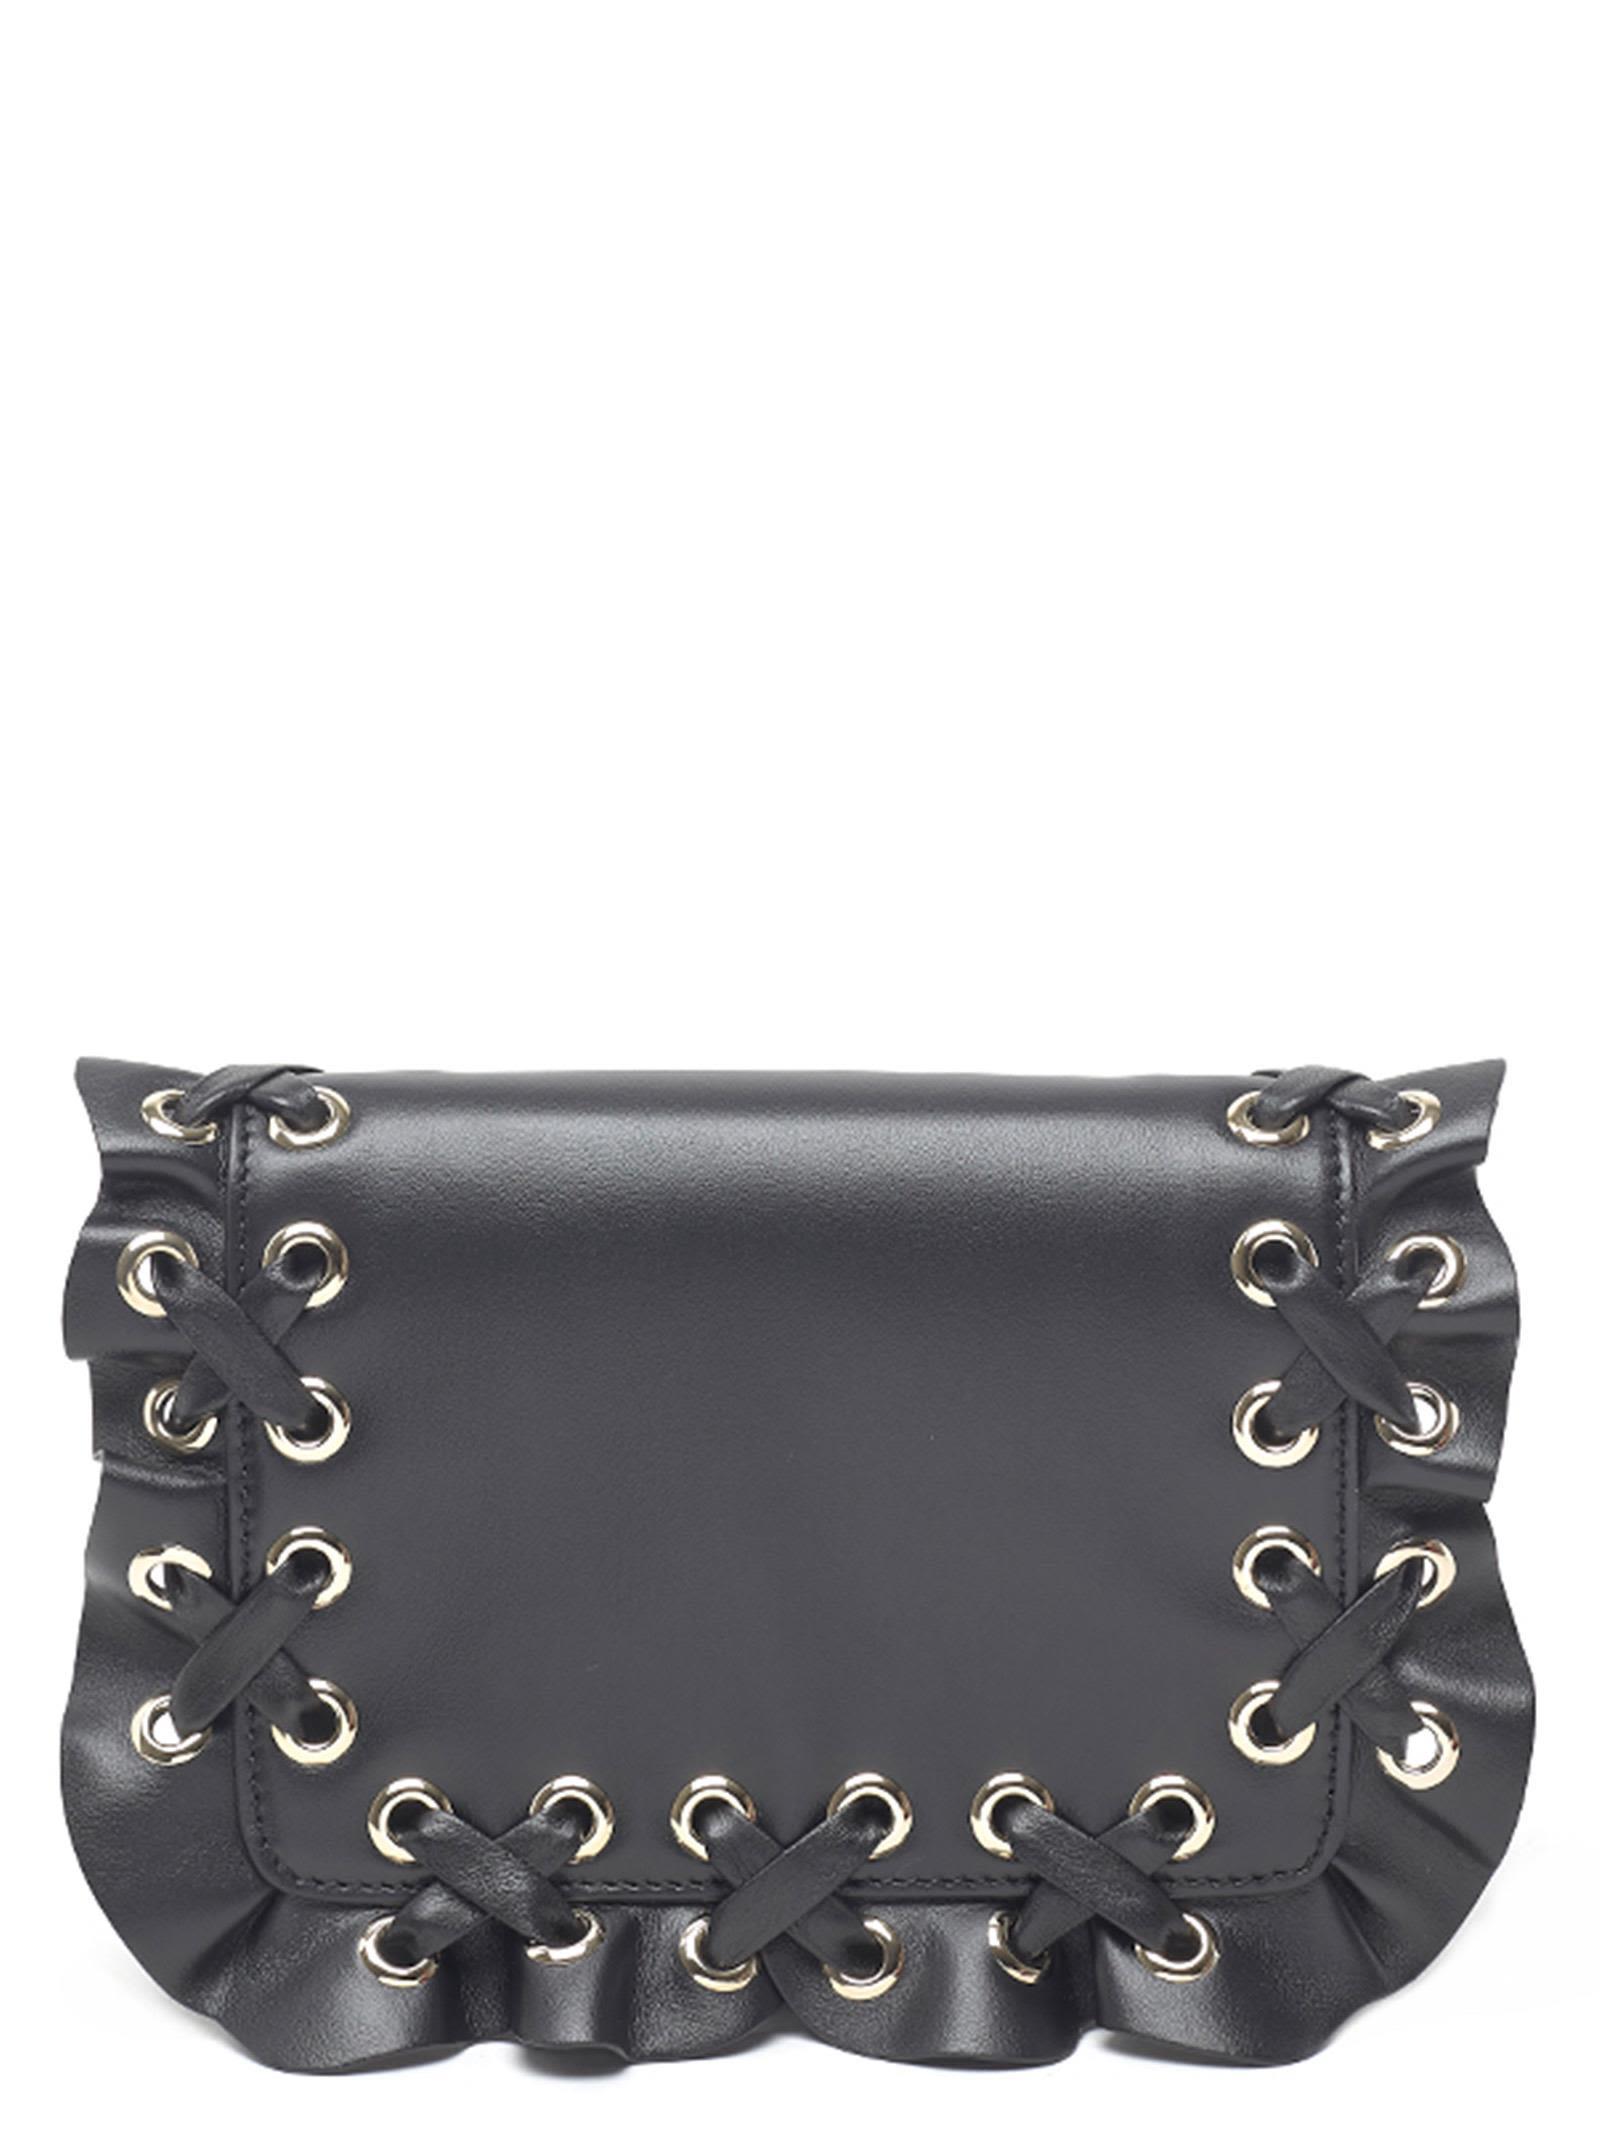 Red Valentino 'Rock Ruffle' Bag, Black